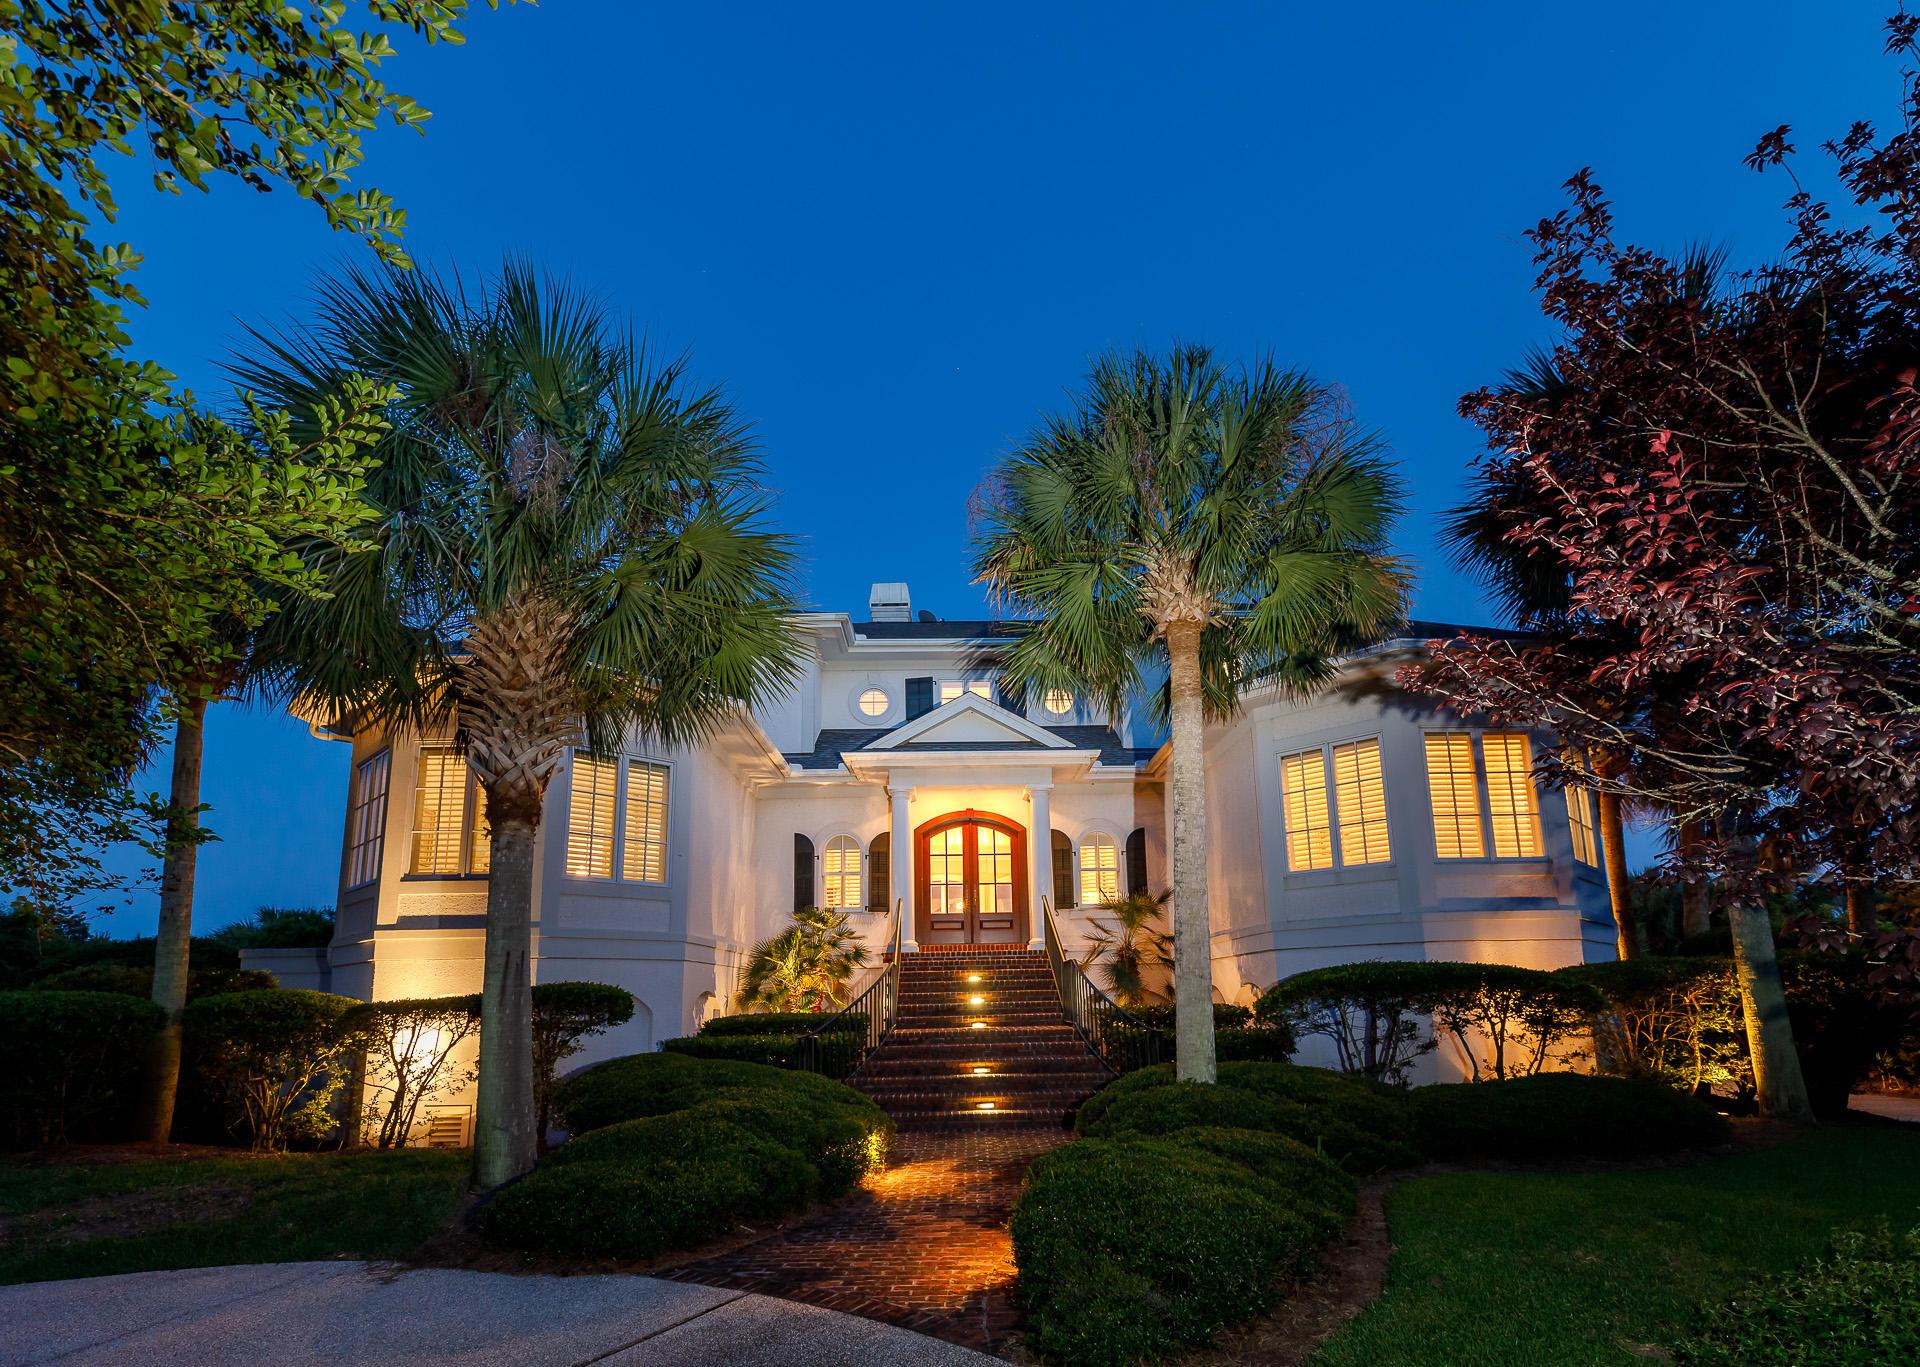 Seabrook Island Homes For Sale - 2216 Rolling Dune, Seabrook Island, SC - 64